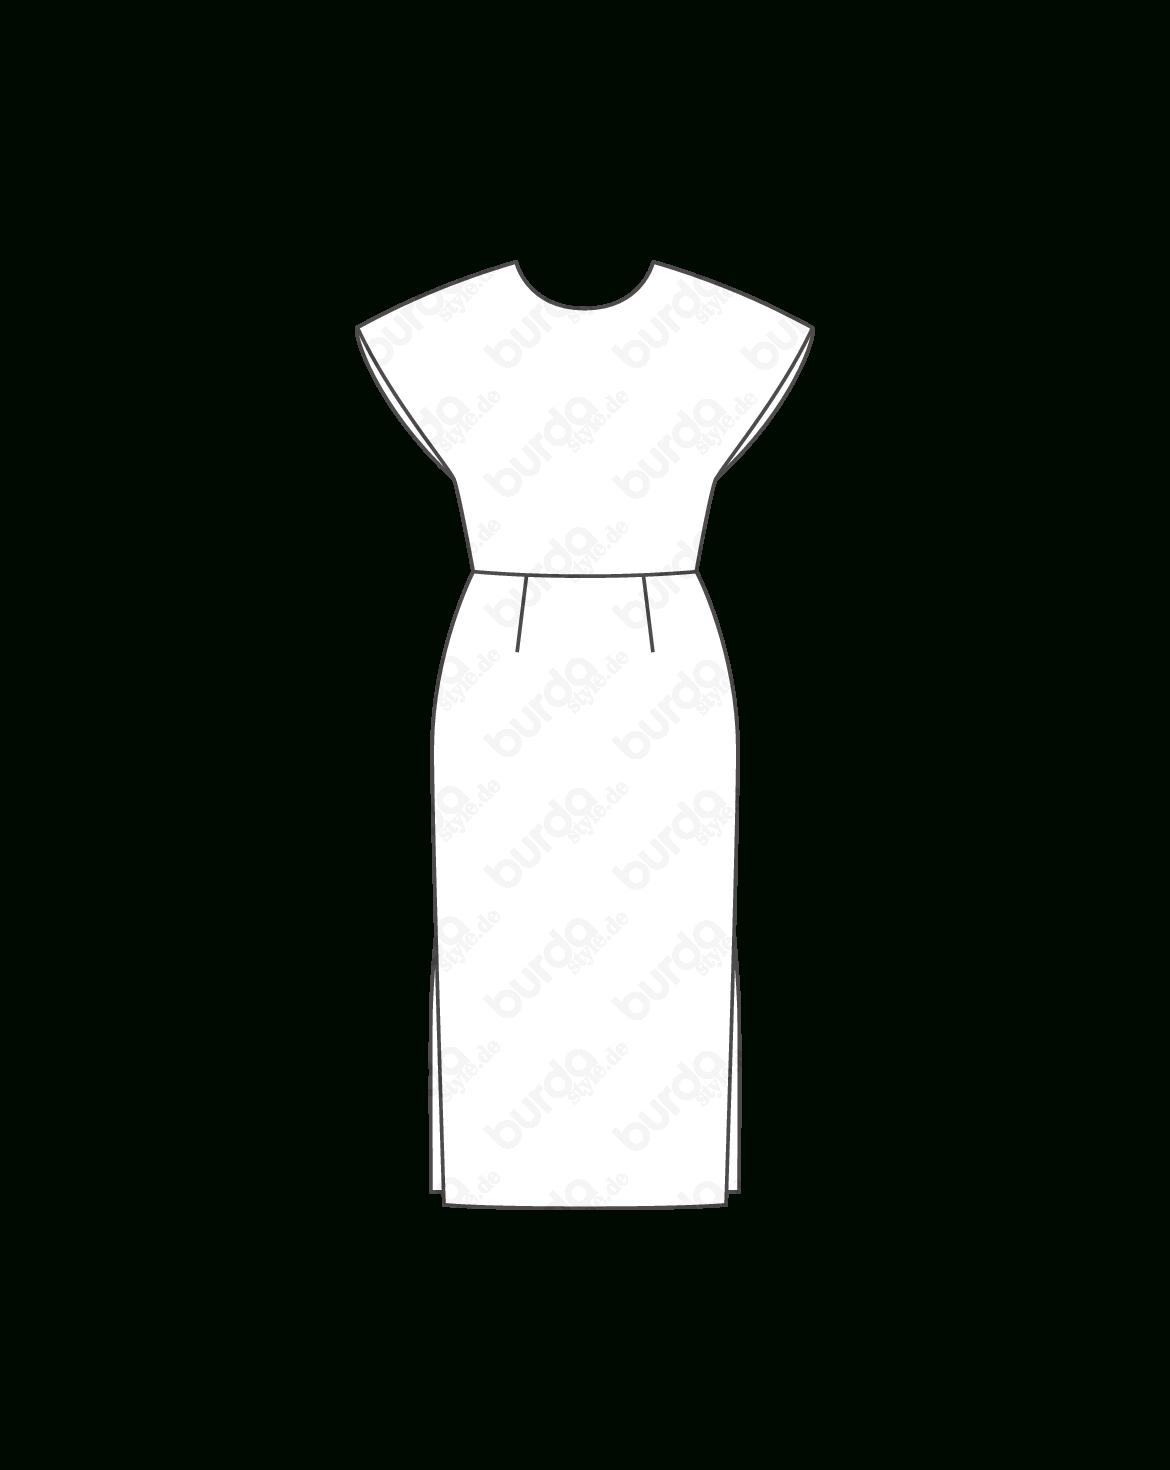 10 Luxus Abendkleid Kürzen Preis Spezialgebiet Top Abendkleid Kürzen Preis für 2019